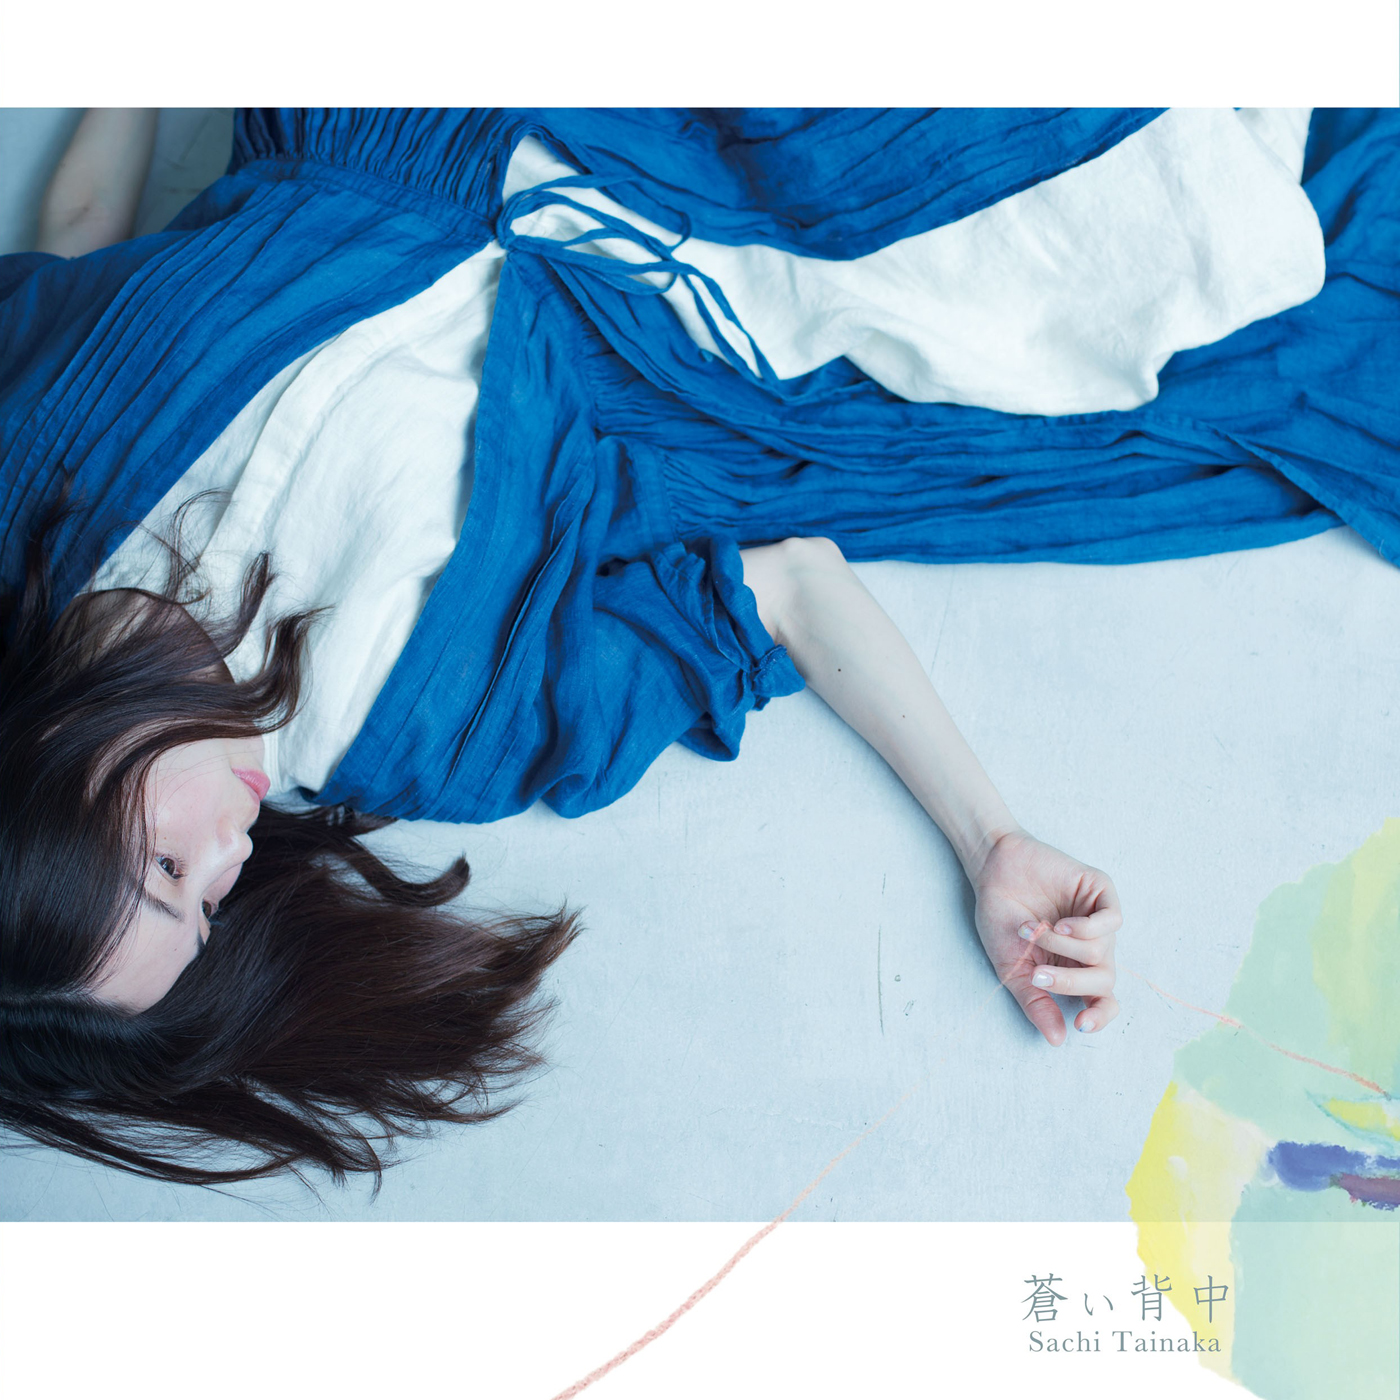 20180910.1009.10 Sachi Tainaka - Aoi Senaka (FLAC) cover.jpg